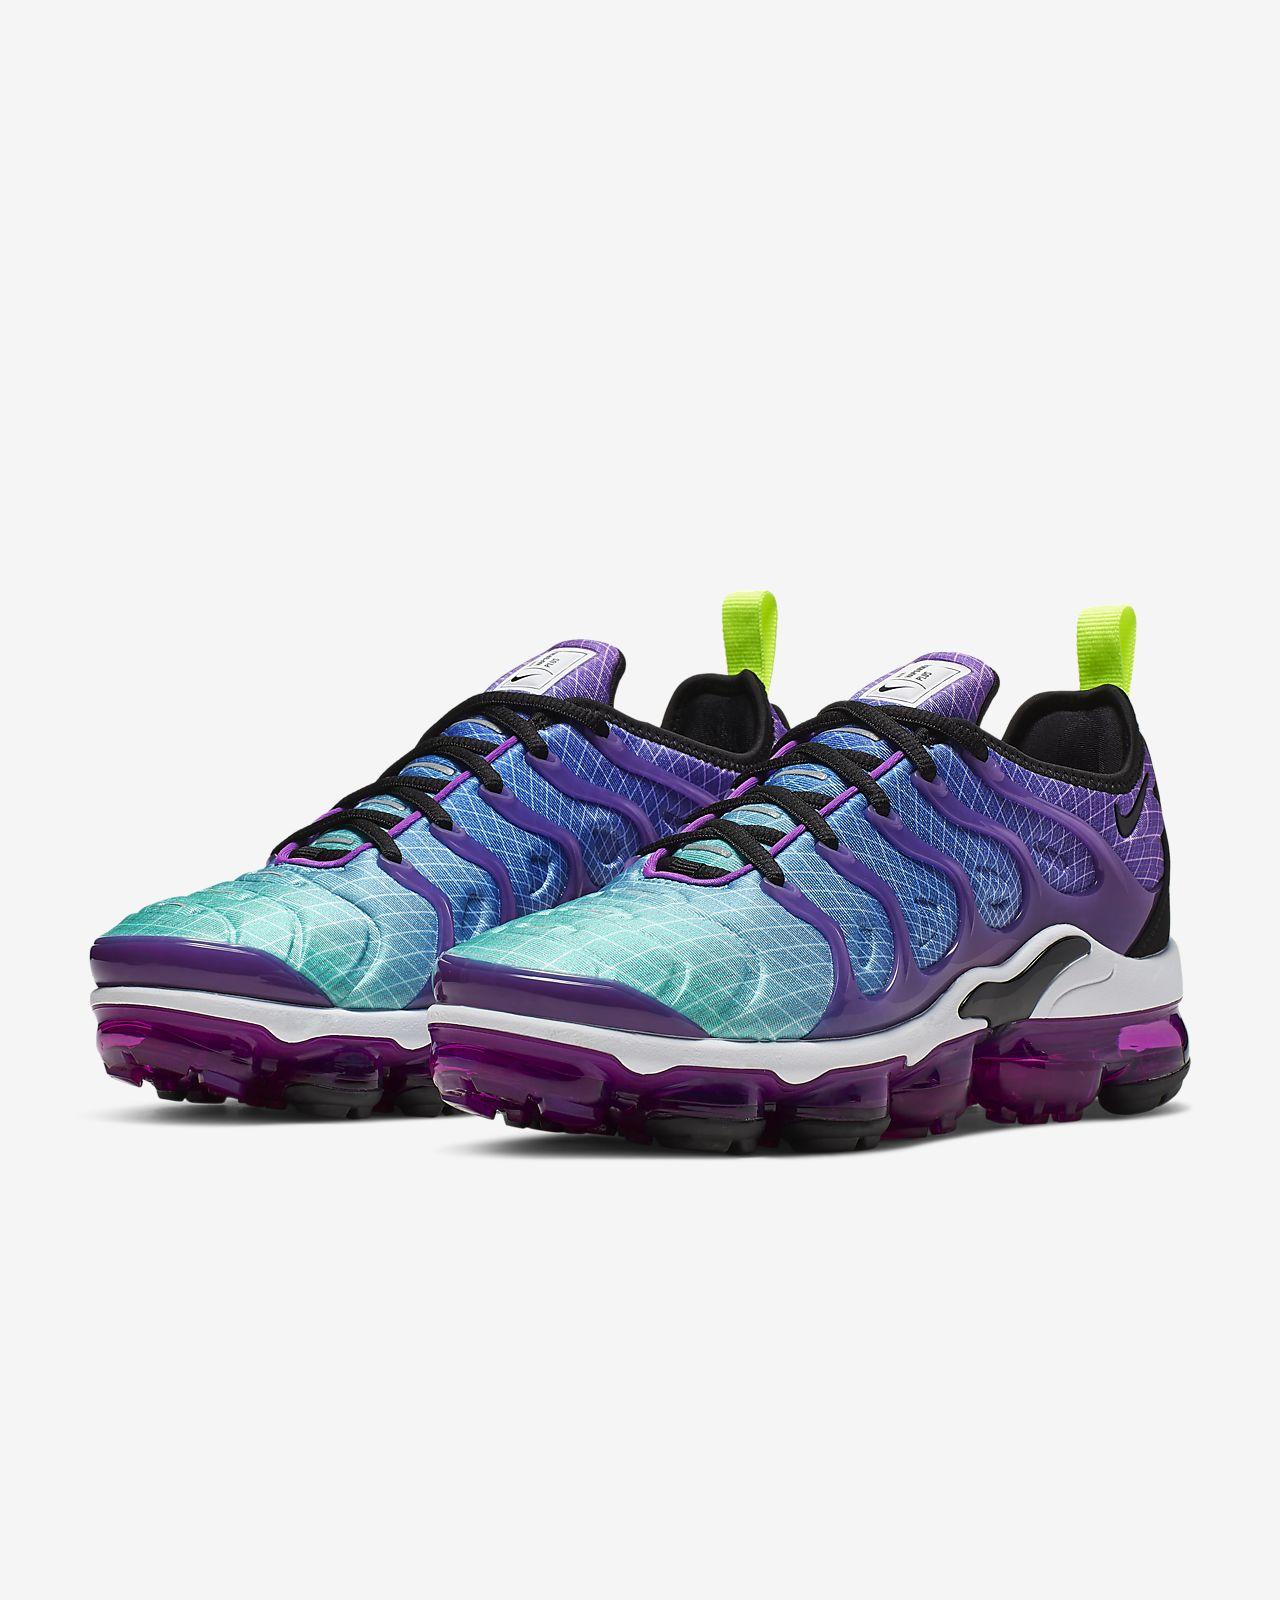 Nike Women's Air Vapormax Plus